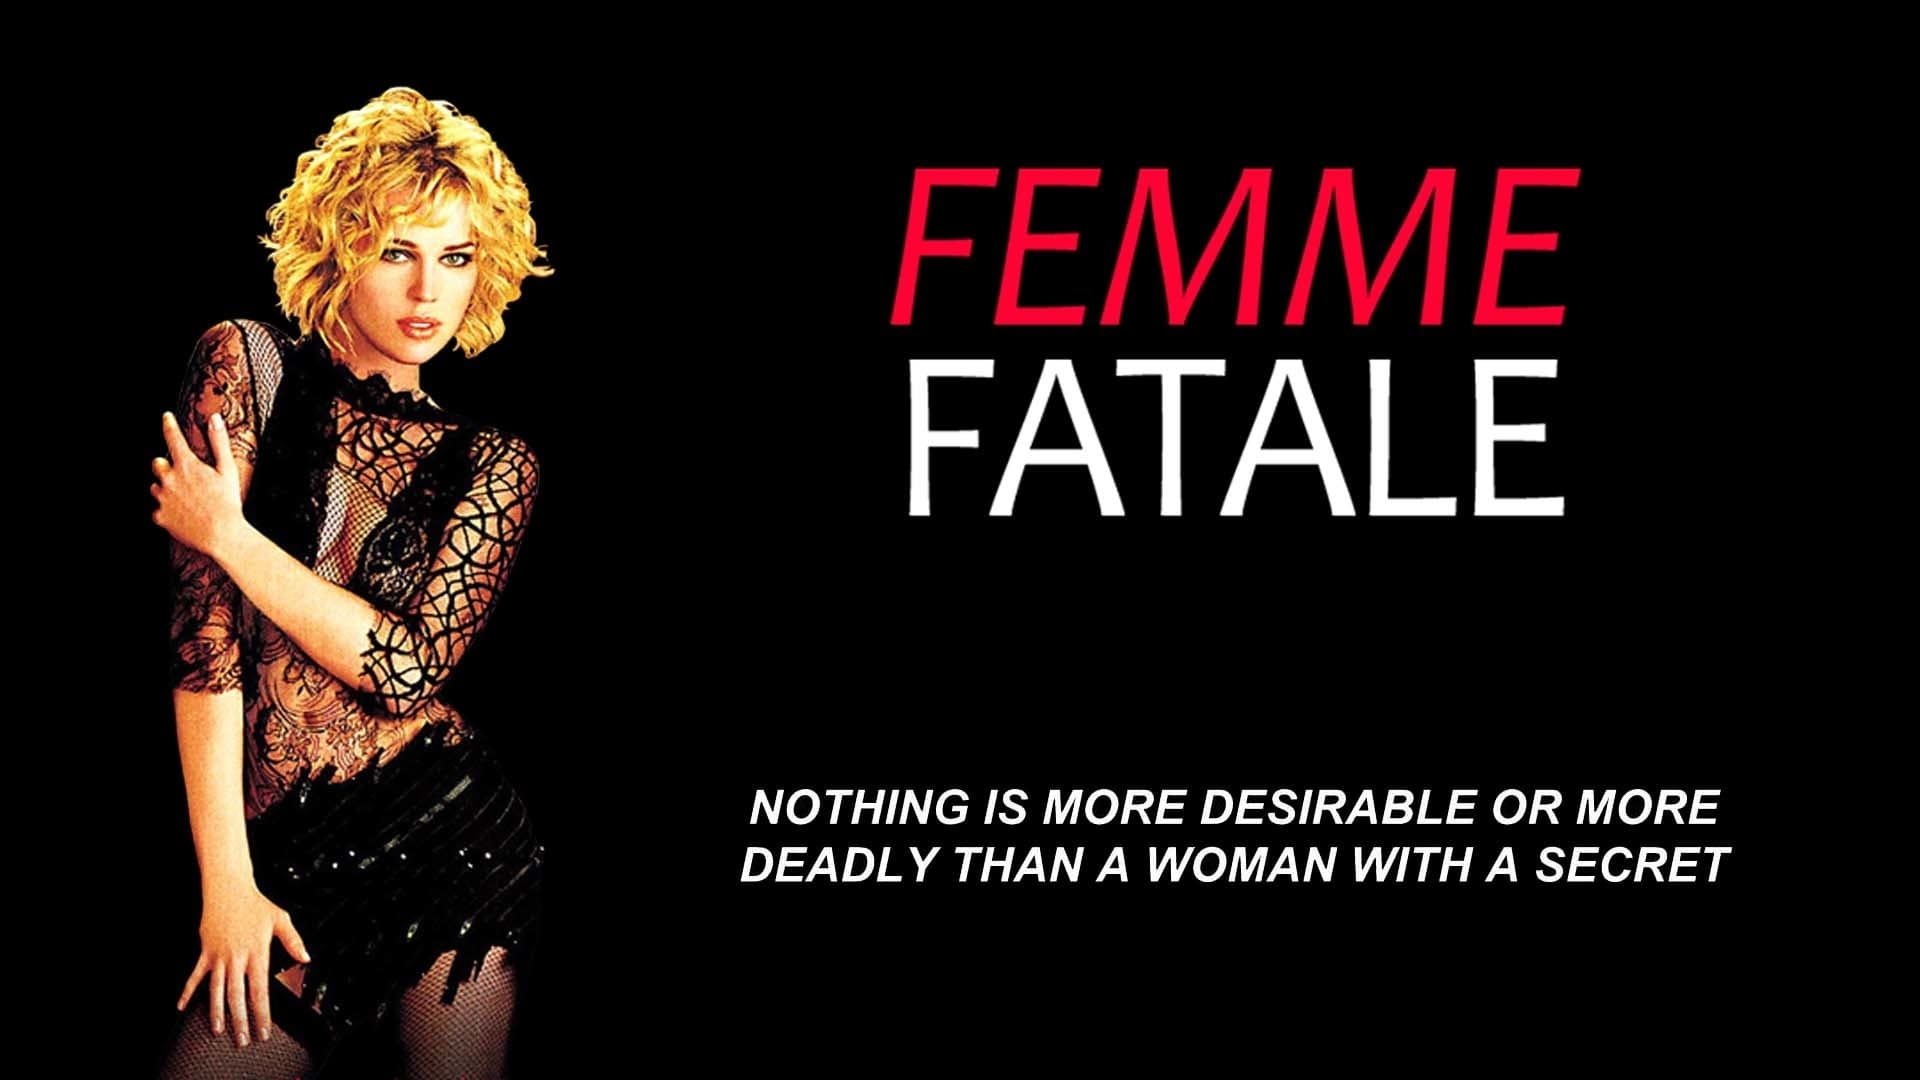 Femme Fatale Movie